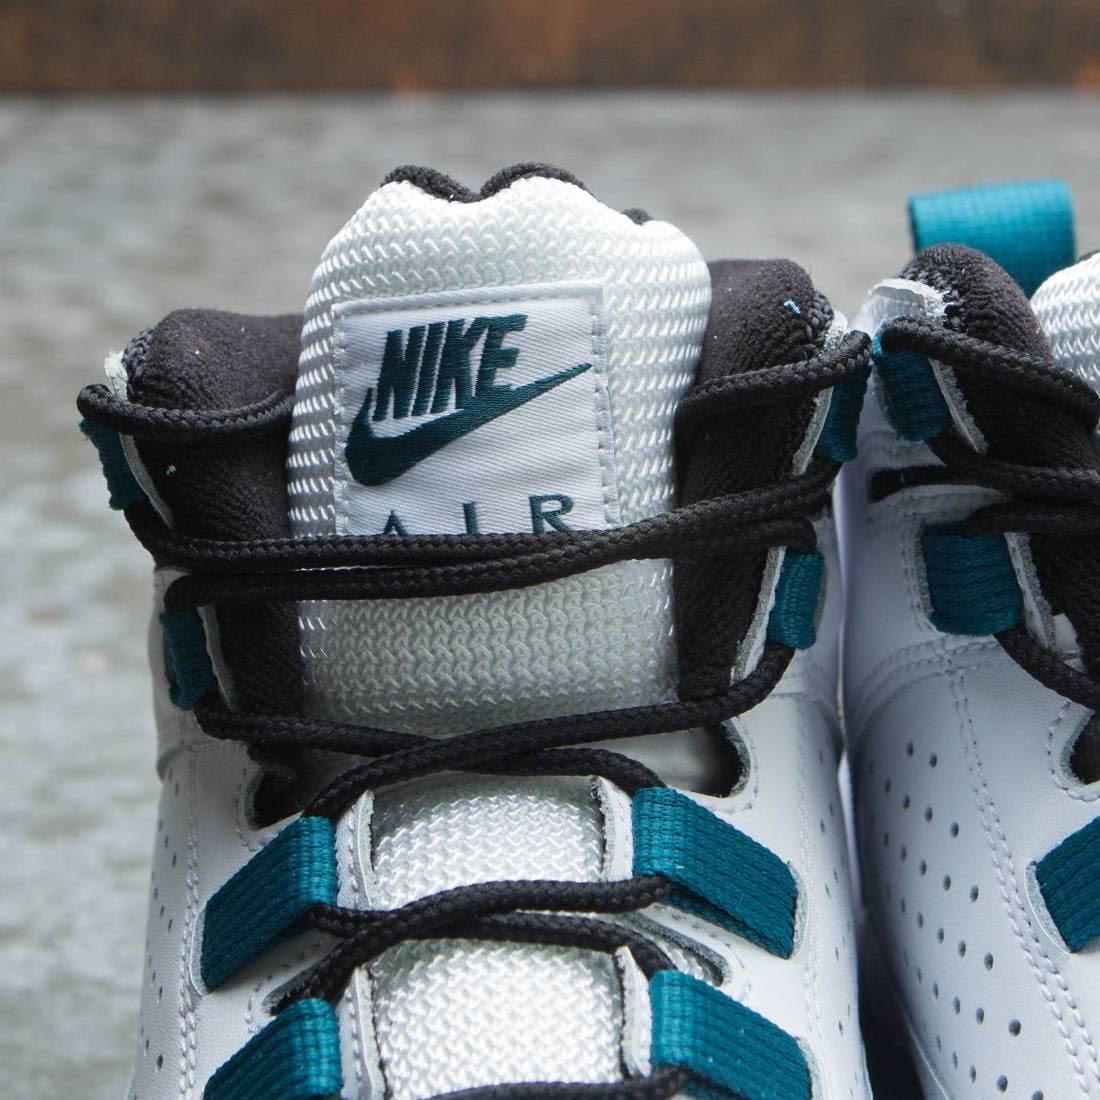 Nike-Air-Darwin-OG-White-Teal-Black-2